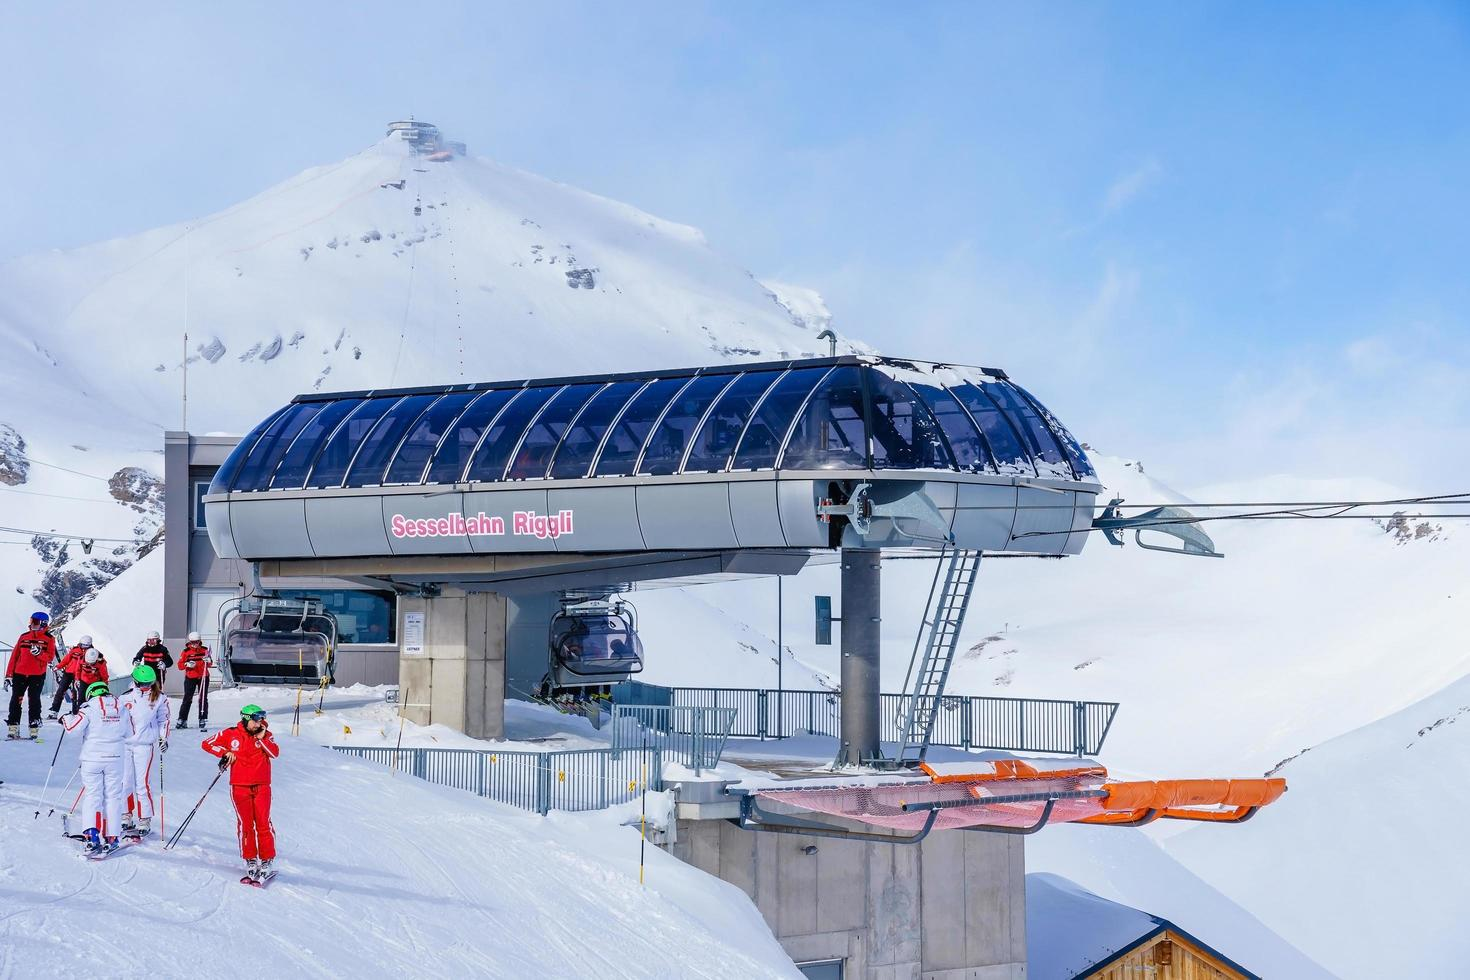 Skiers in the Swiss alps in Murren, Switzerland photo